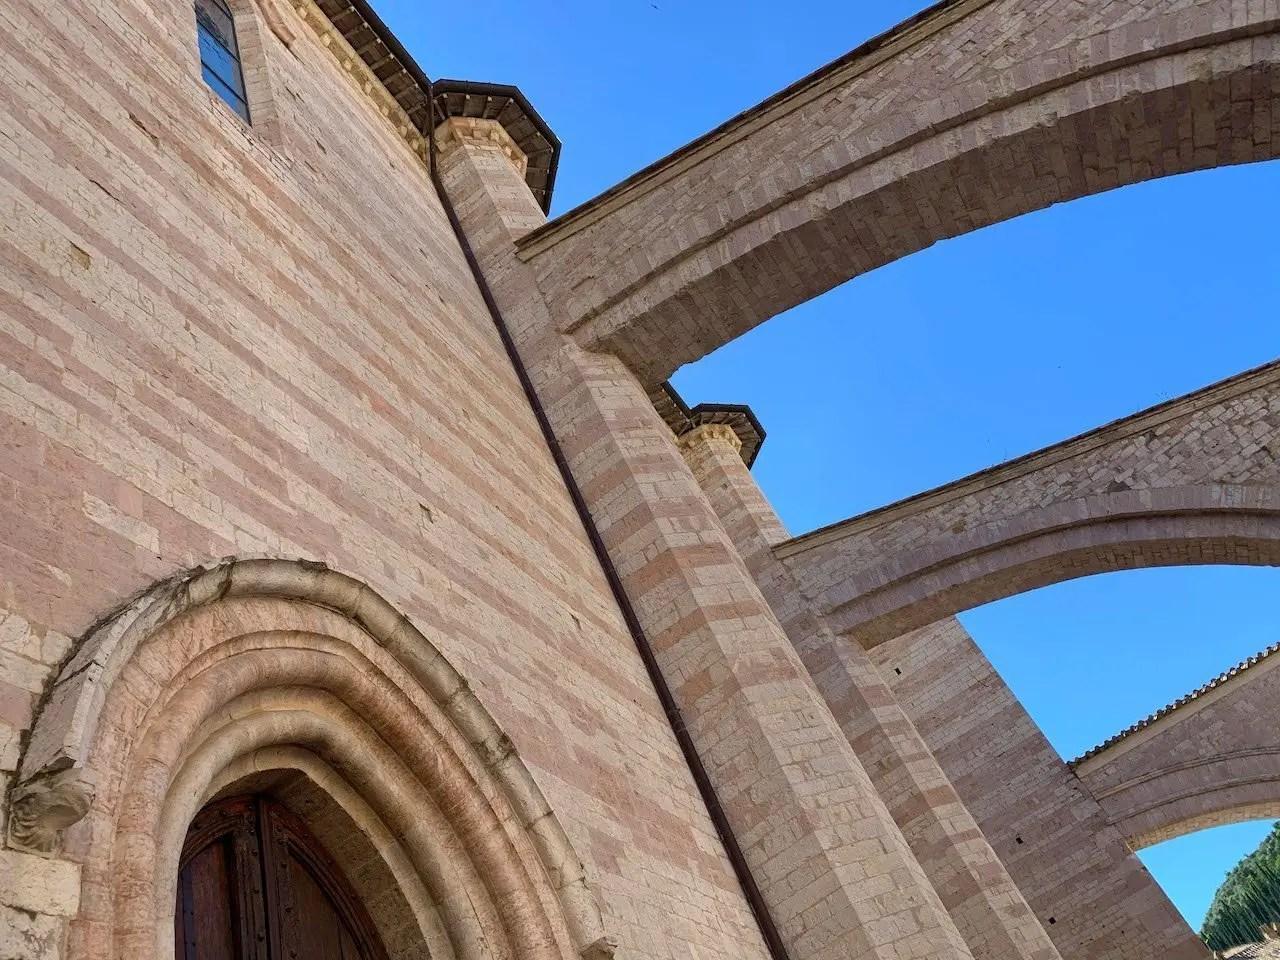 chiese di Assisi